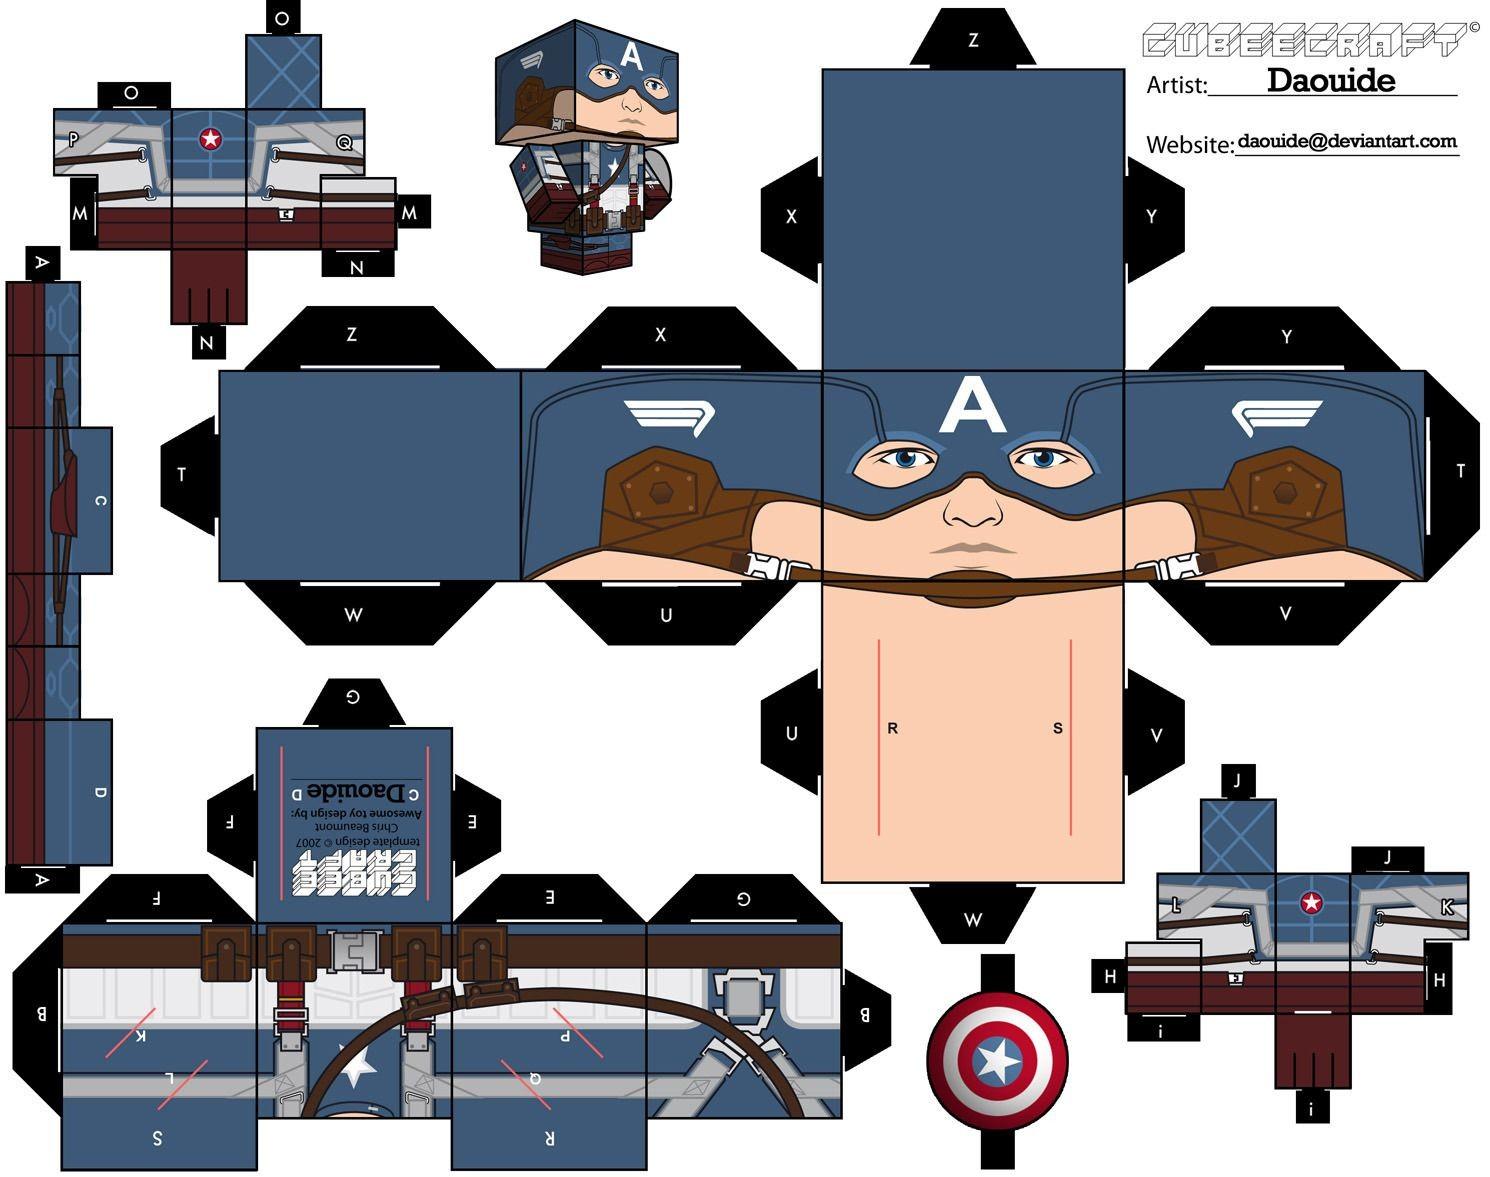 Futurama Papercraft Megapost] Papercraft Tus Personajes Preferidos En Papel